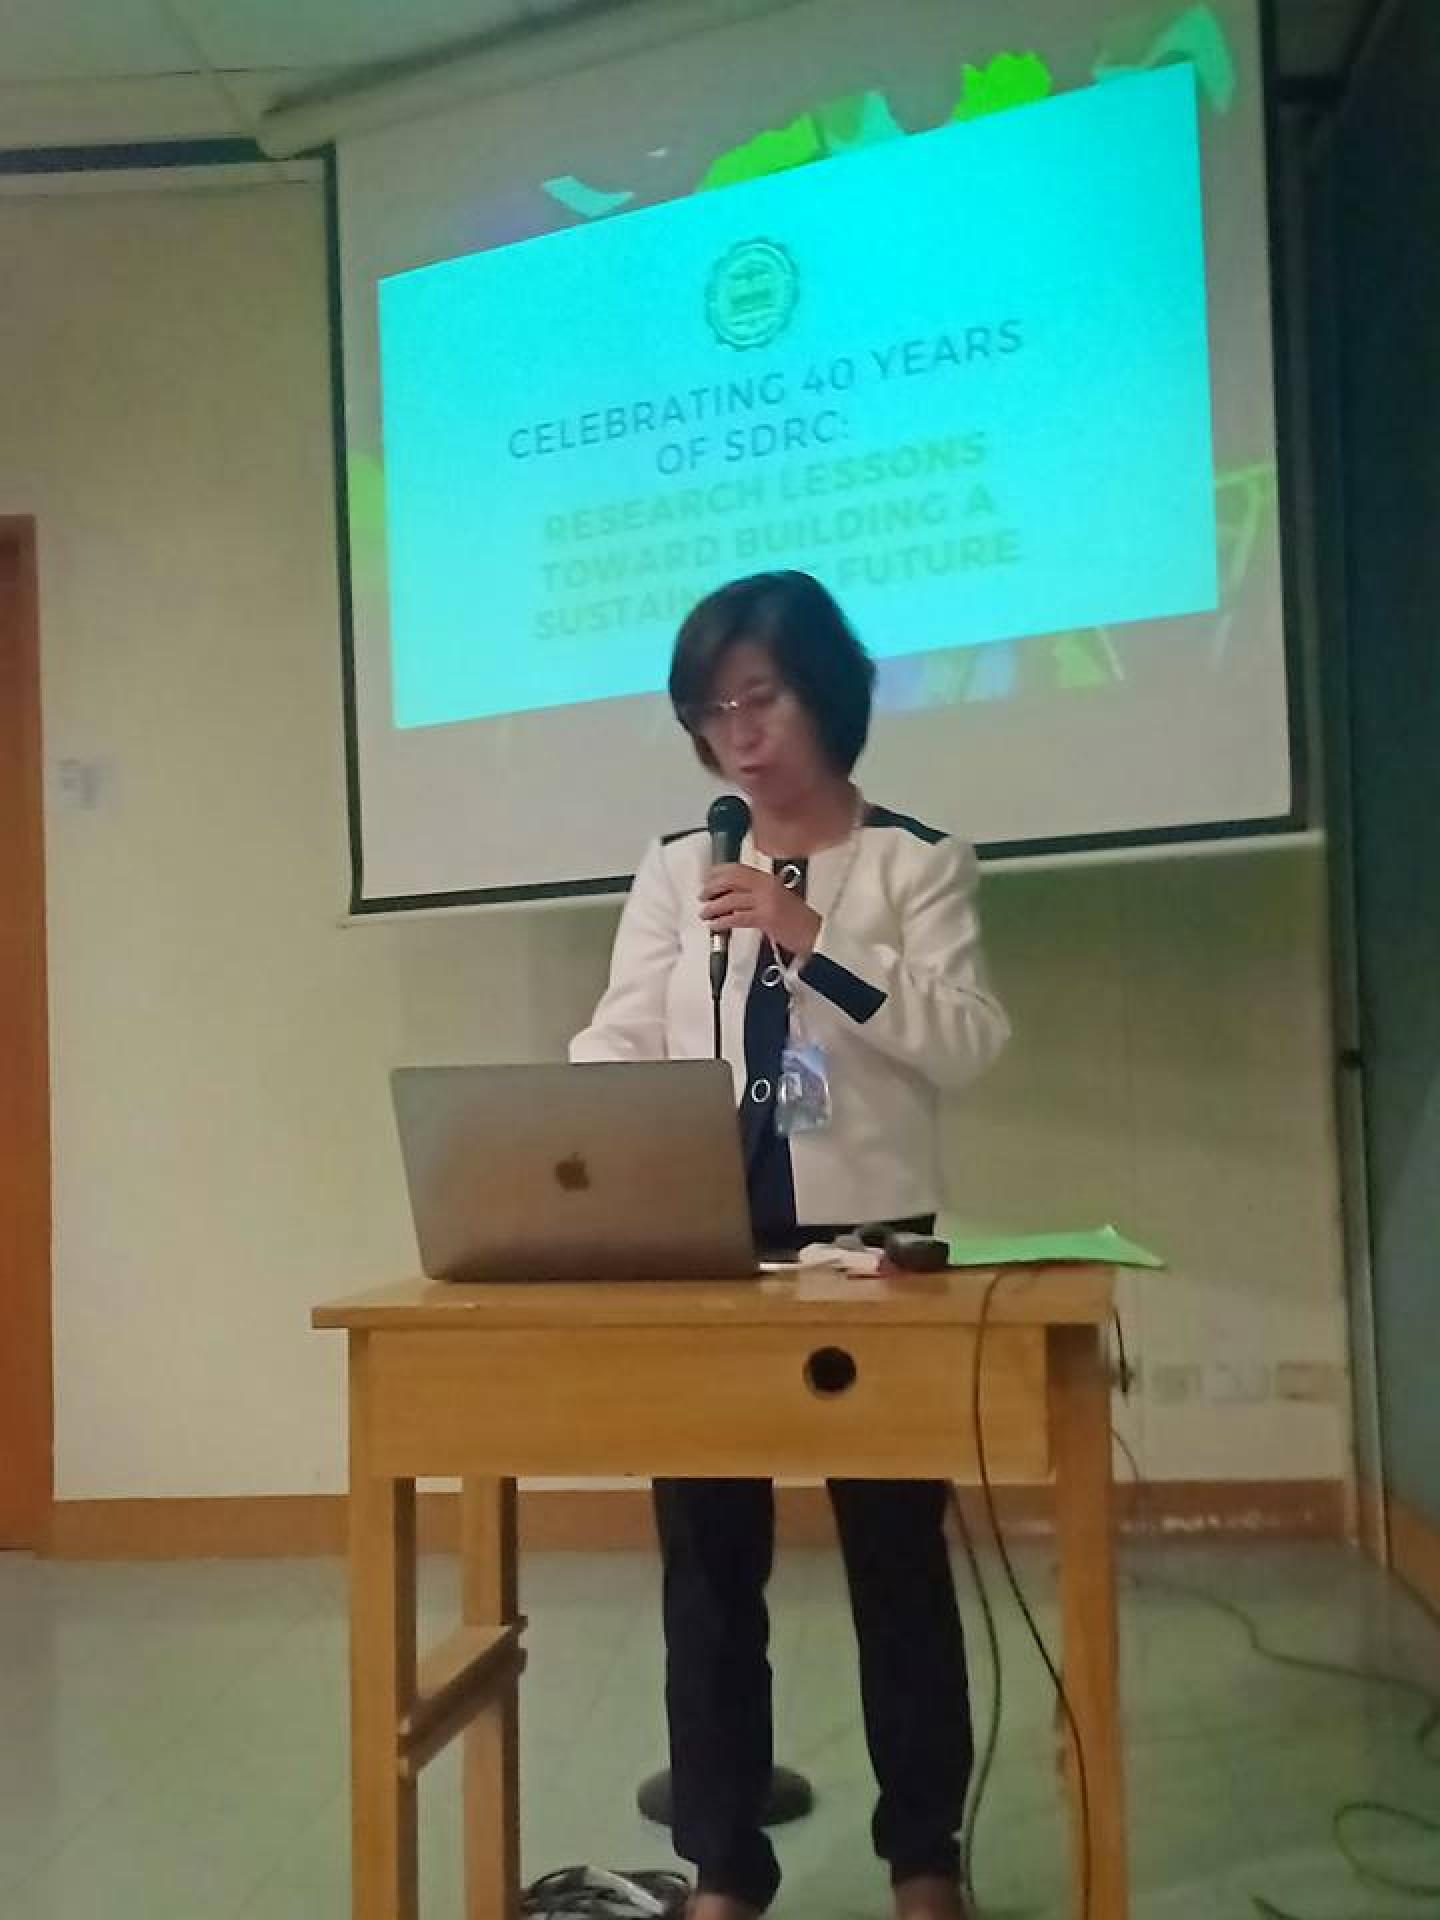 Caring-Tarojja-SDRC-training-on-Ethics-of-reserach